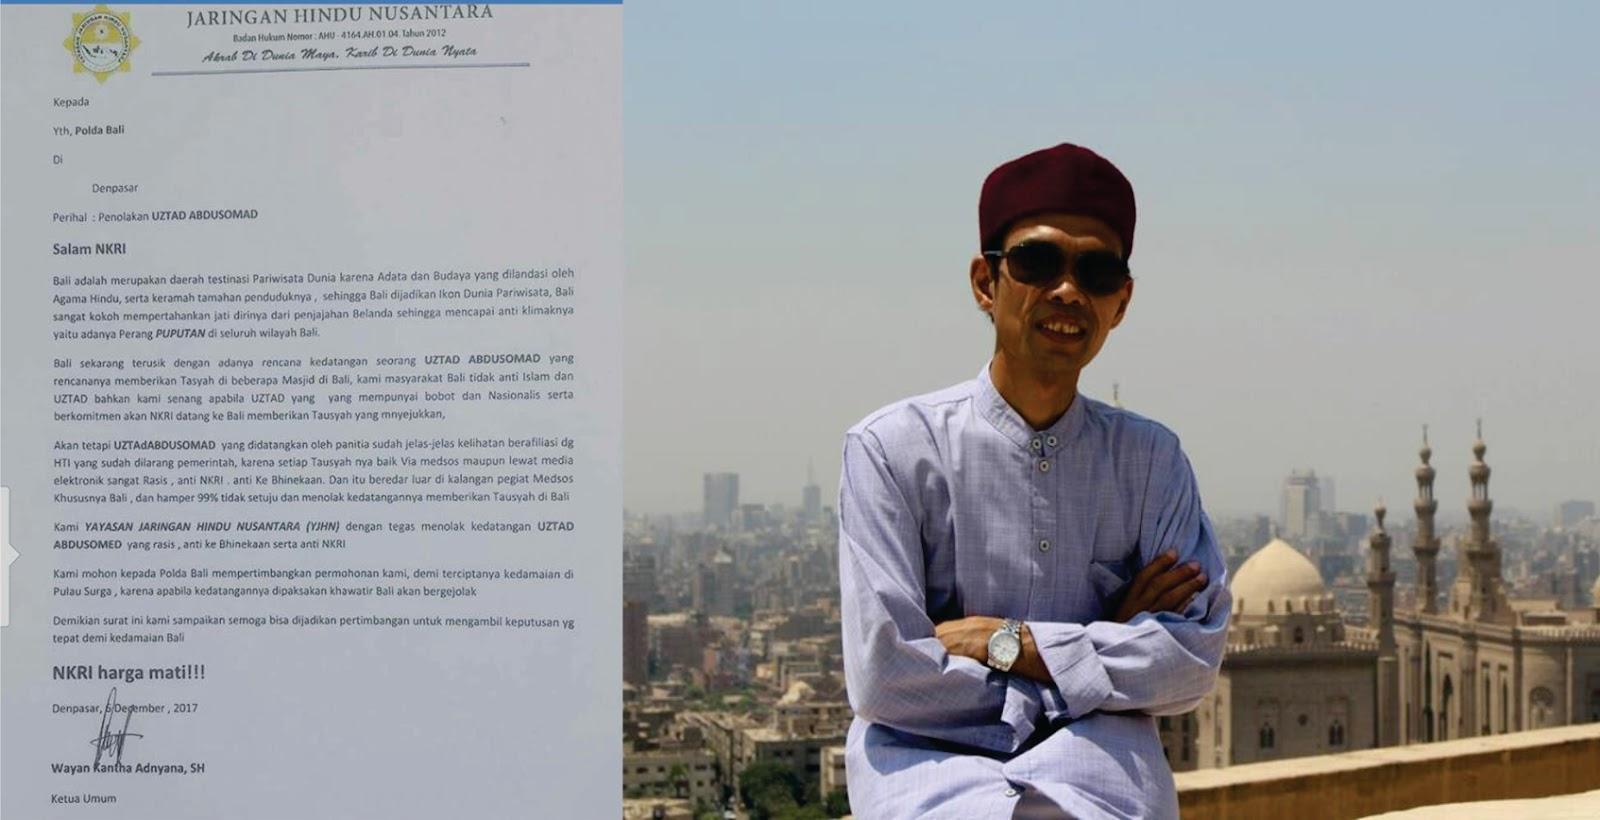 "Dengan Dalih ""NKRI Harga Mati"" Jaringan Hindu Nusantara Tolak Ustadz Abdul Somad ke Bali"